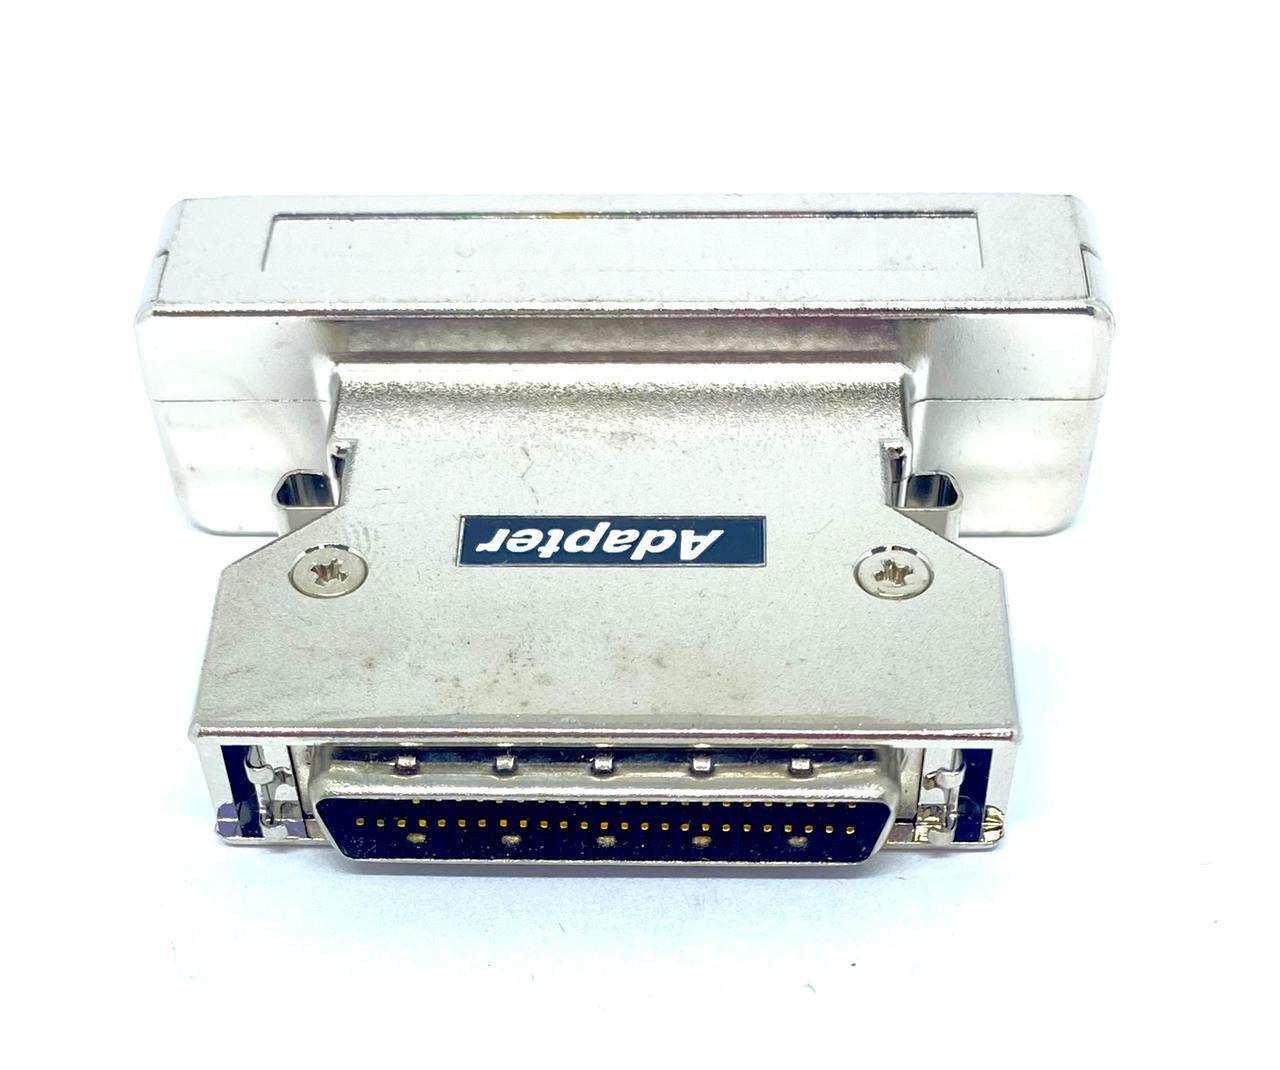 ADAPTADOR SCSI3 HD68 FEMEA PARA SCSI2 HD50 MACHO AS120 (SCSI3F-SCSI2M)